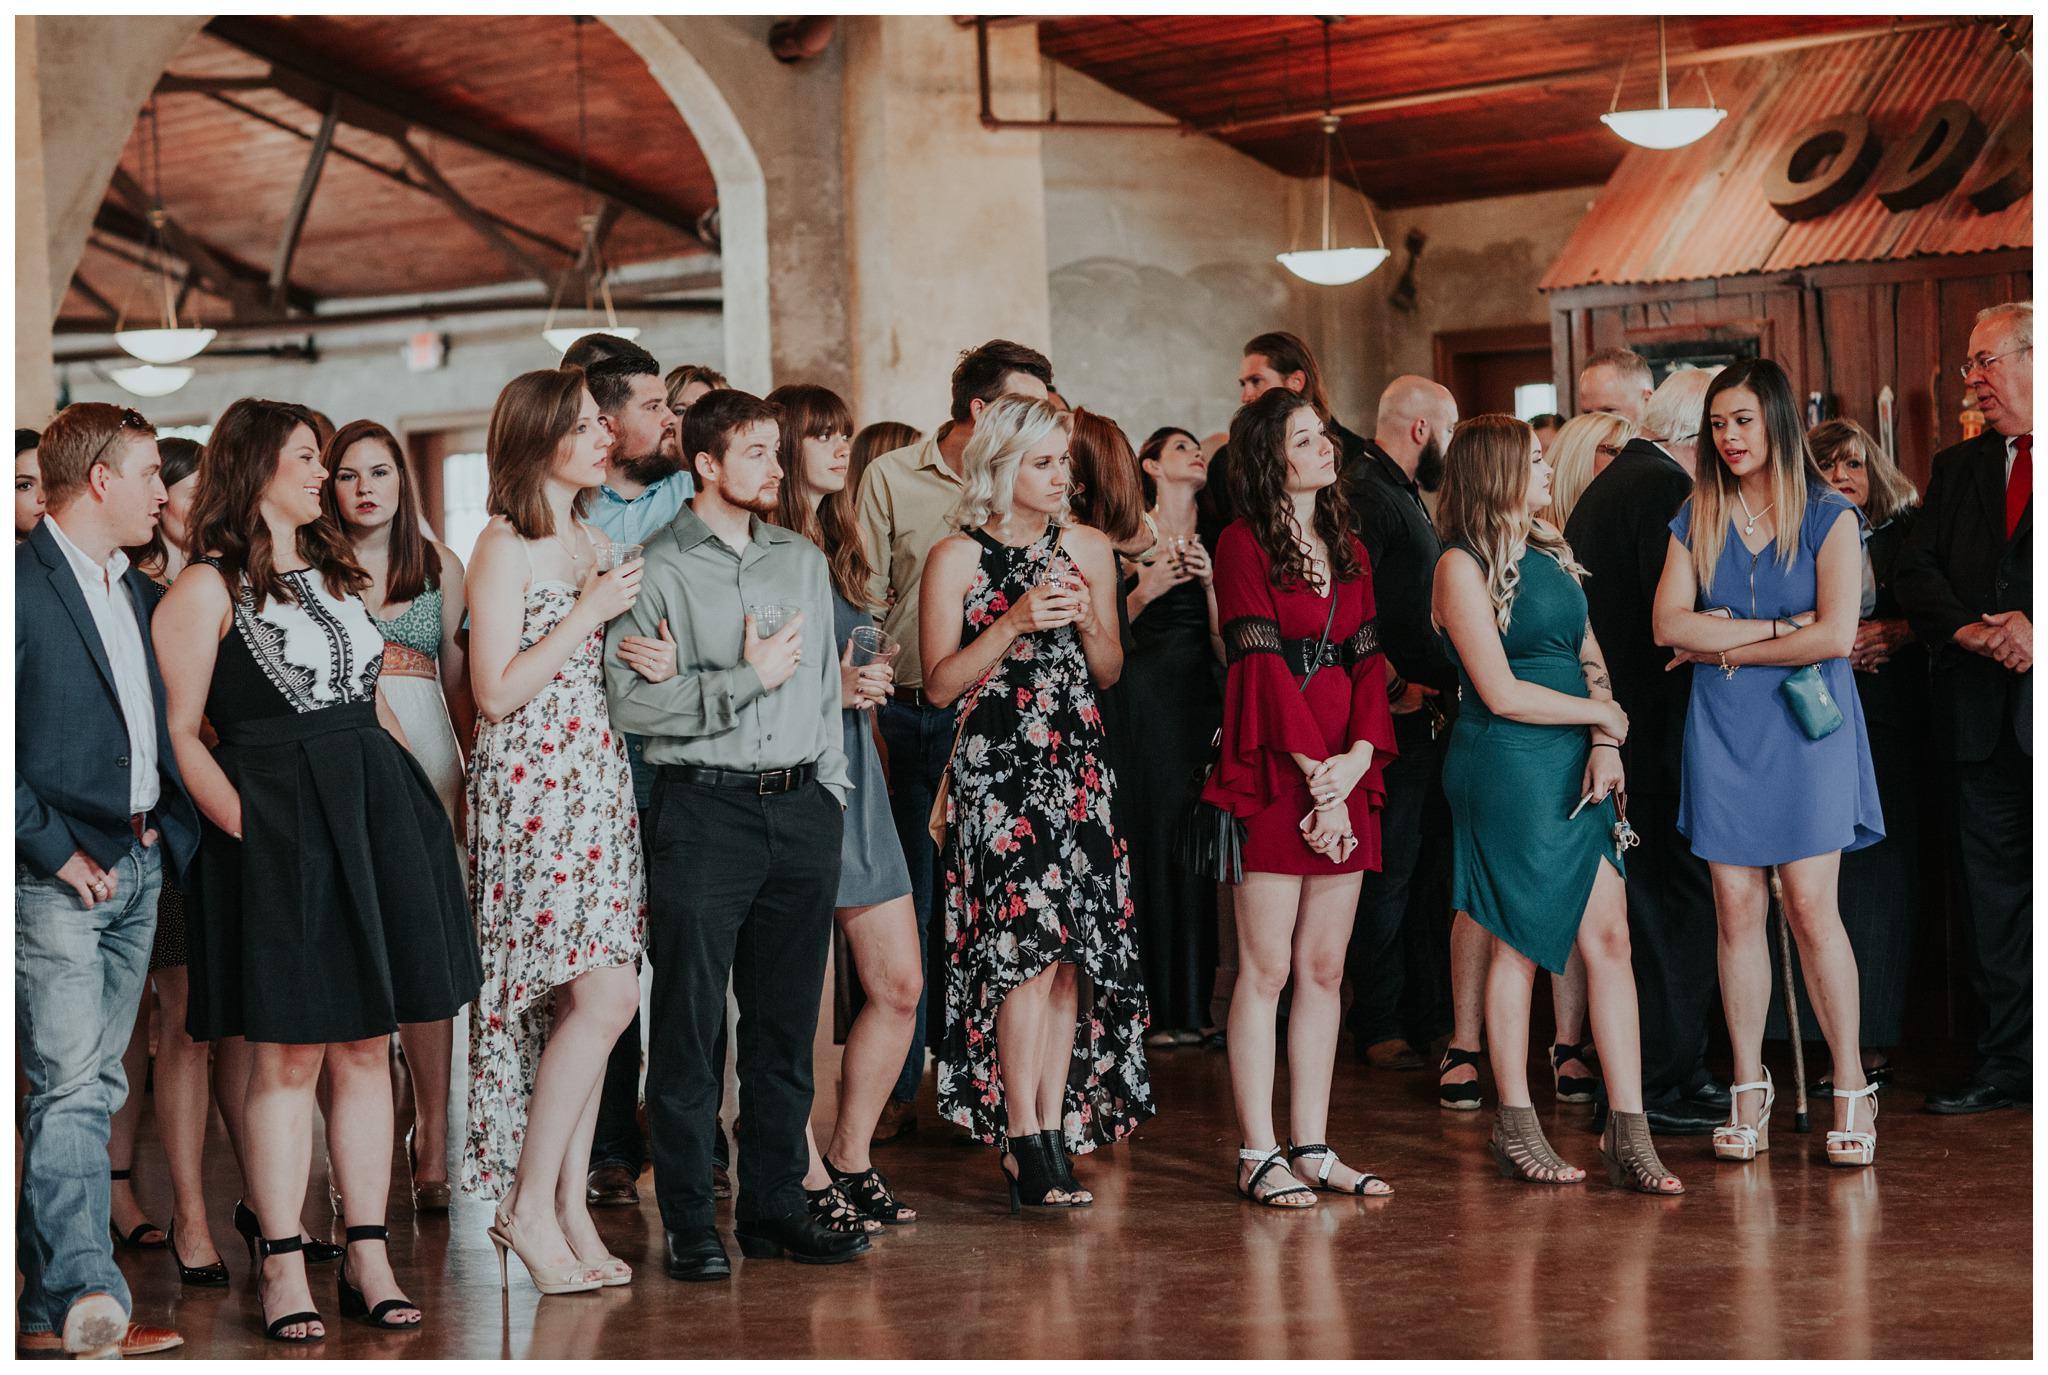 Summertime Olde Dobbin Station - Magnolia Wedding - The Woodlands Texas Wedding Photographer-2158.jpg